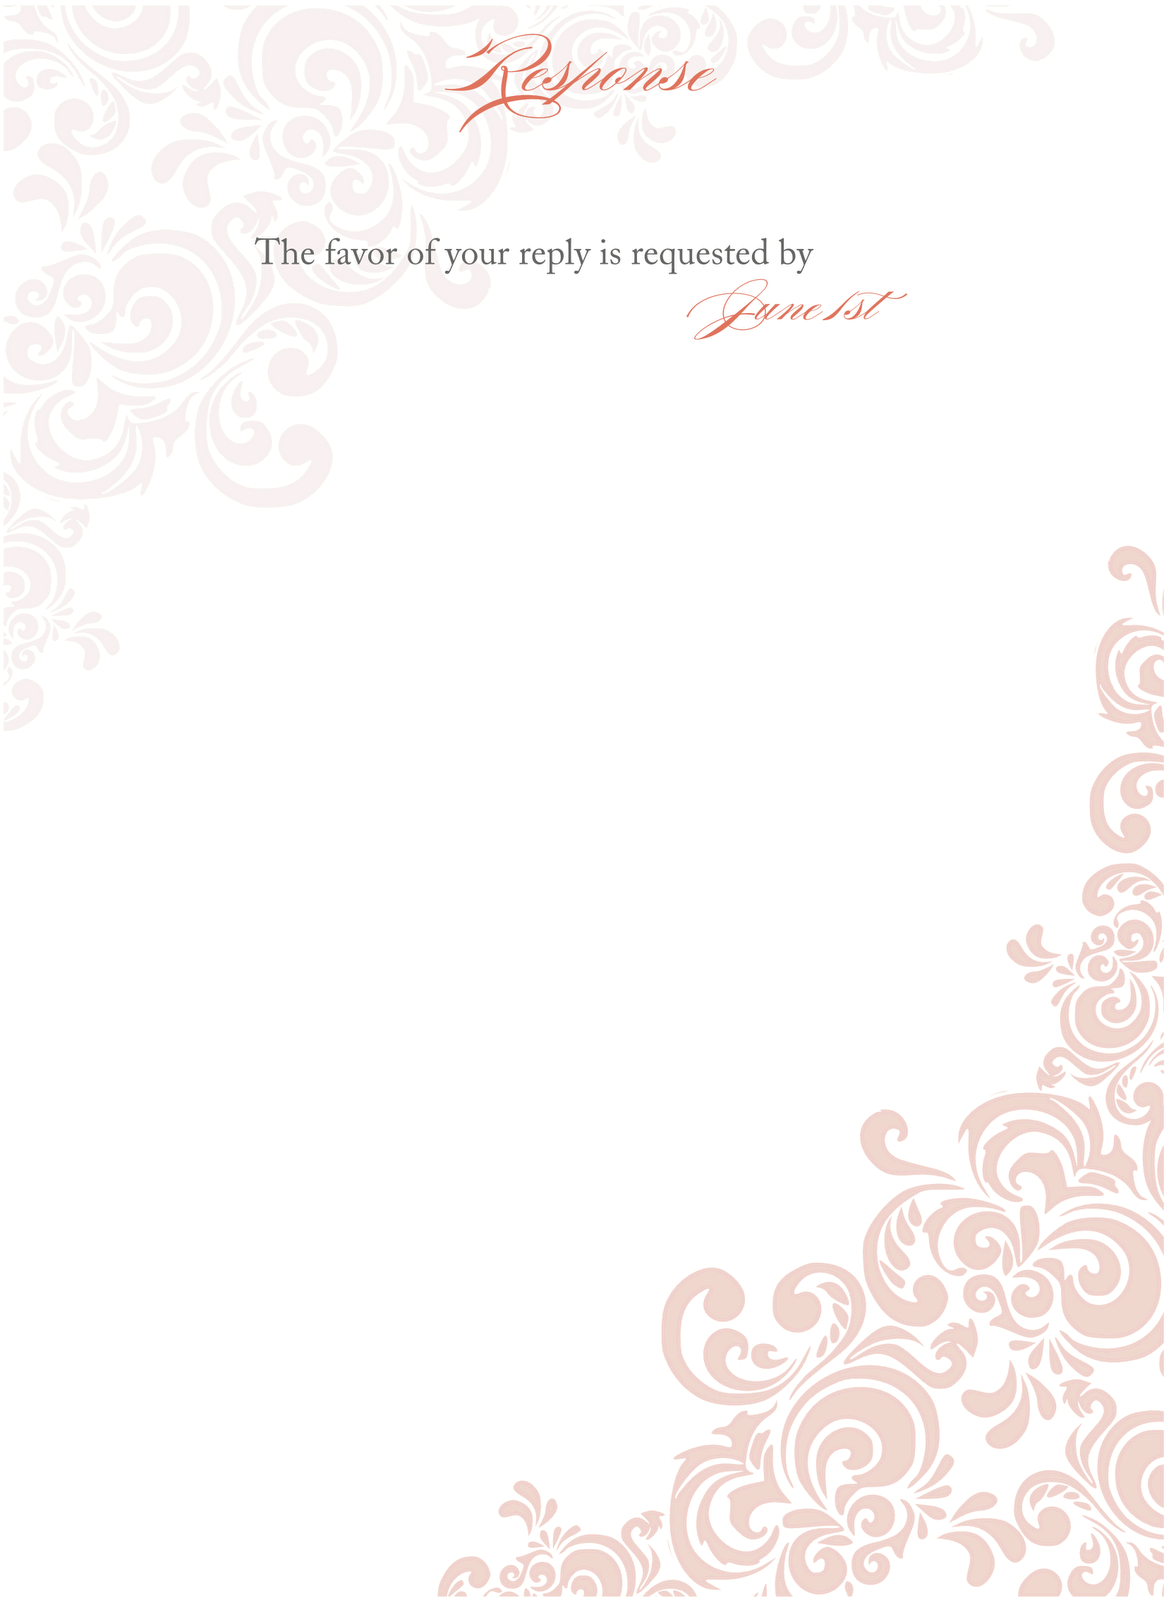 Blank Wedding Invitation Design.